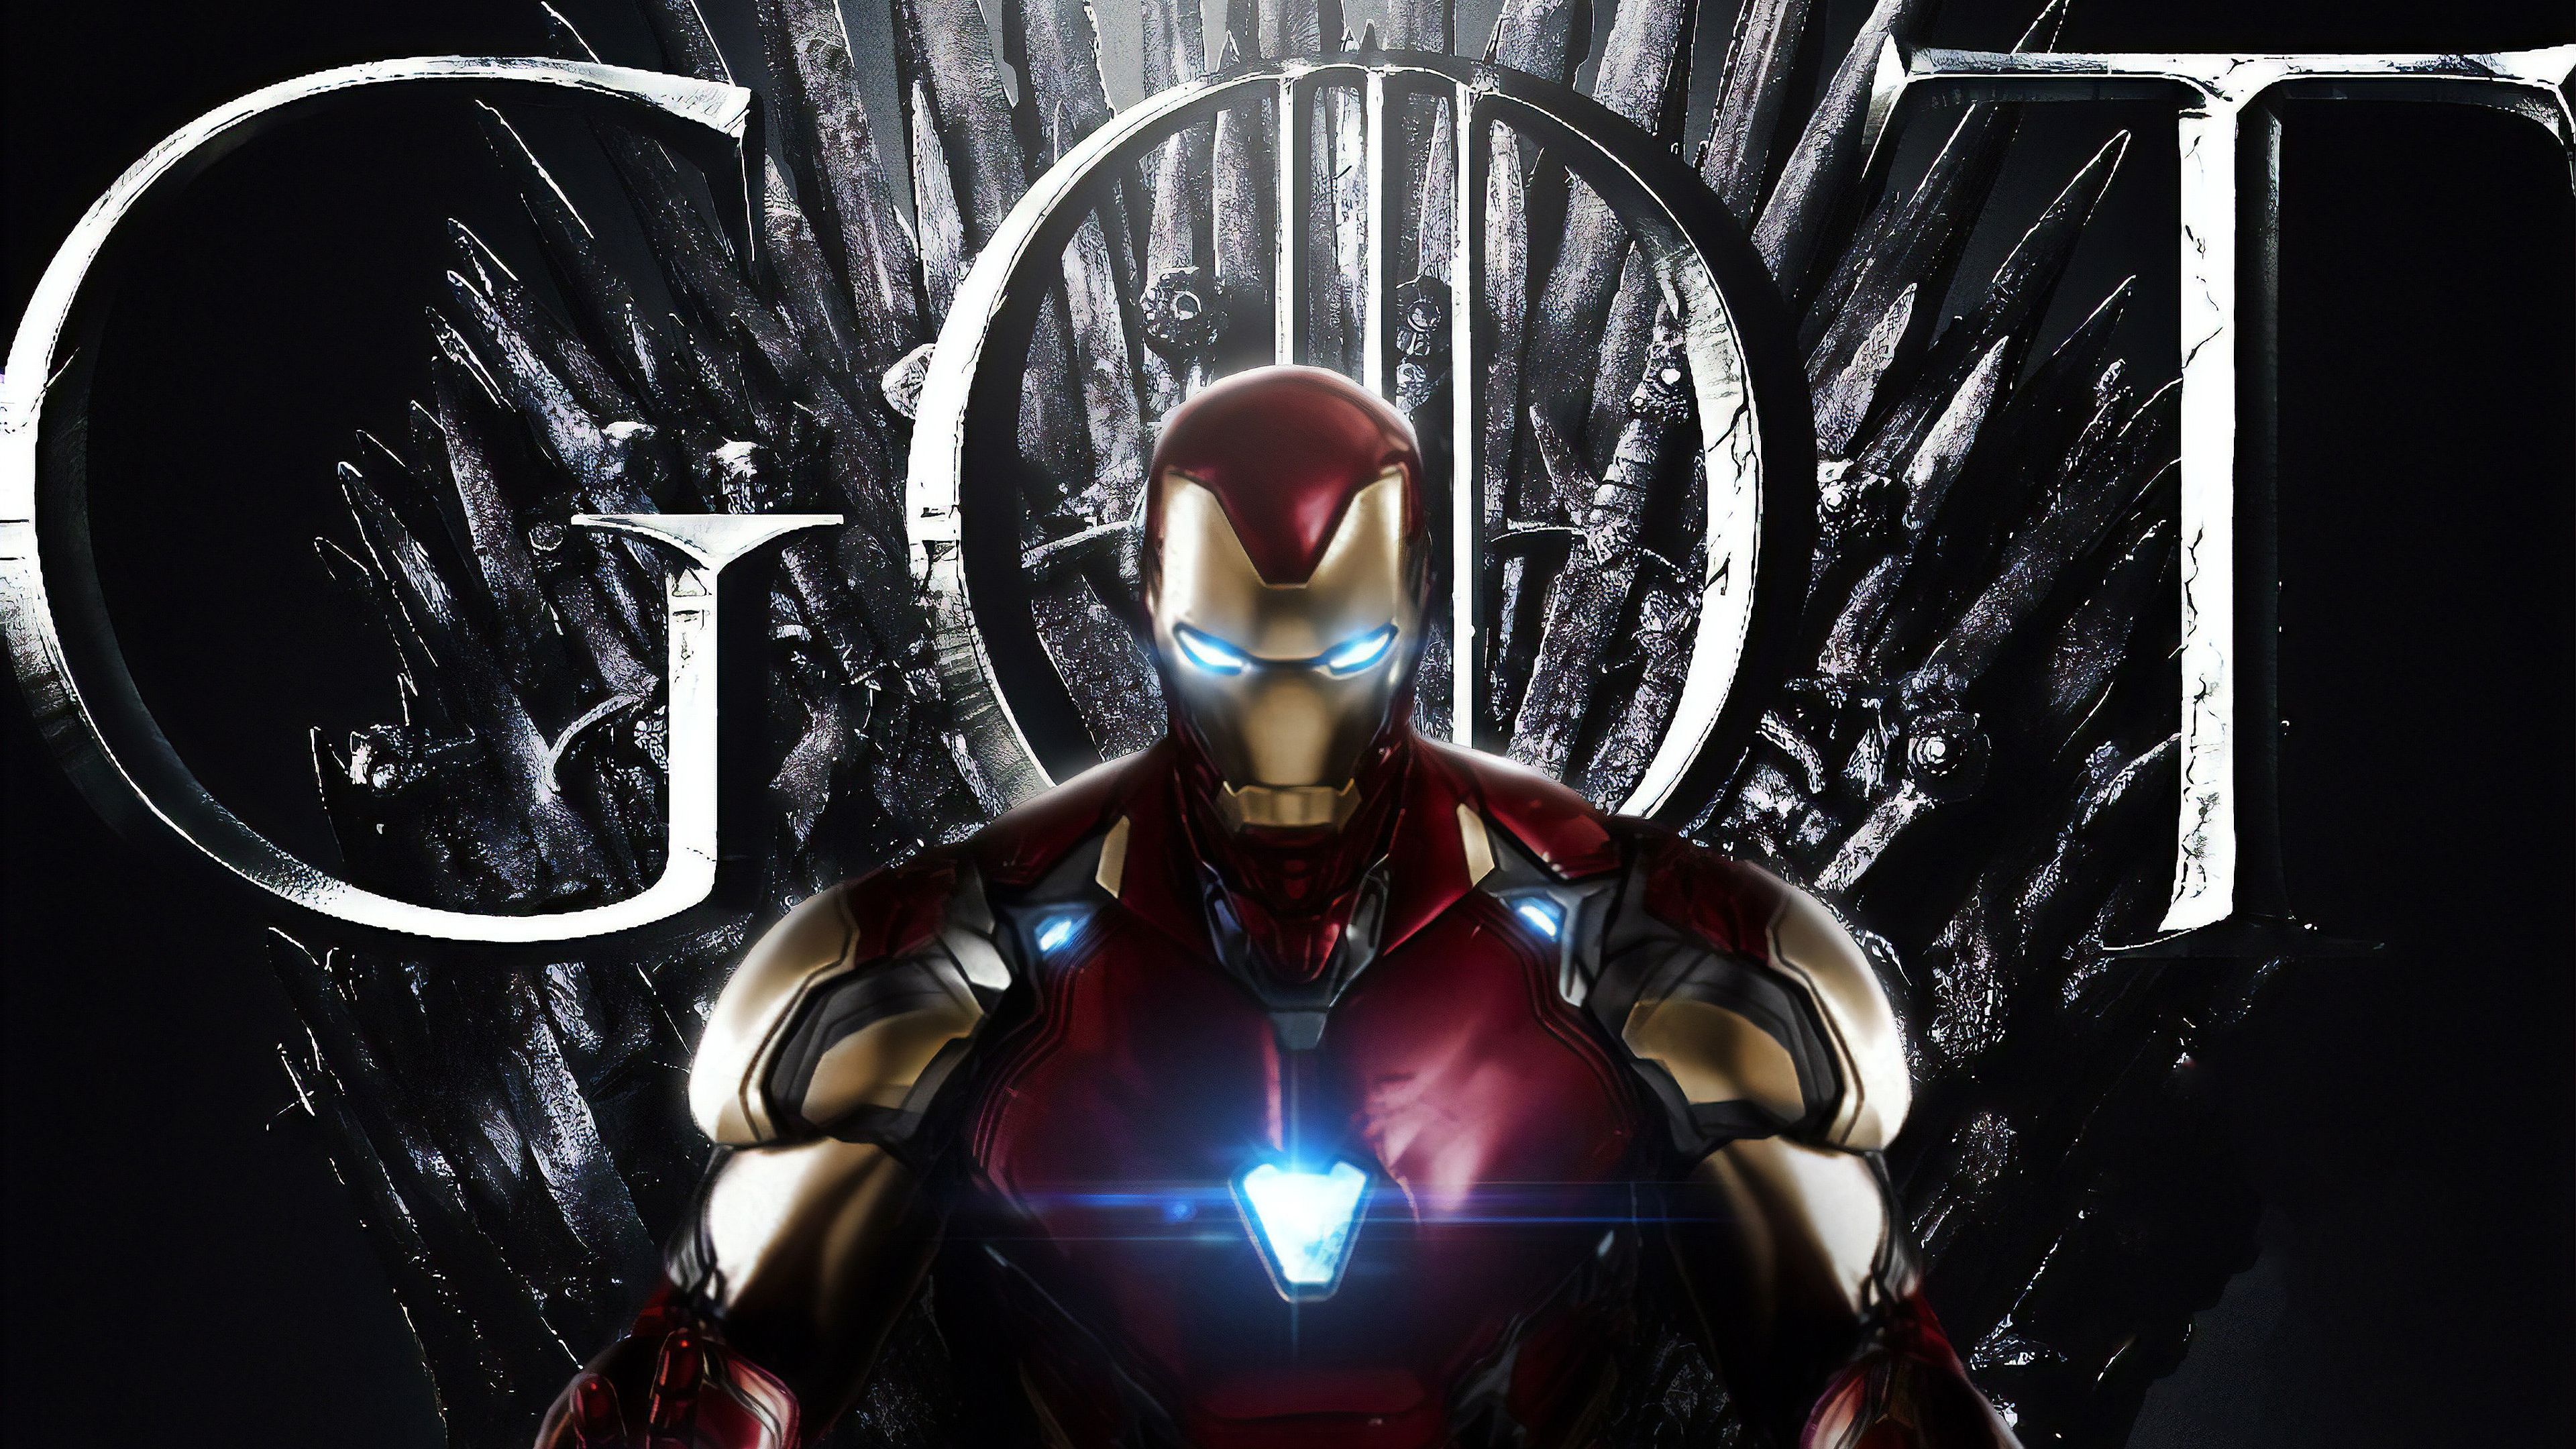 iron man throne 1560533673 - Iron Man Throne - superheroes wallpapers, iron man wallpapers, hd-wallpapers, deviantart wallpapers, artwork wallpapers, artist wallpapers, 4k-wallpapers